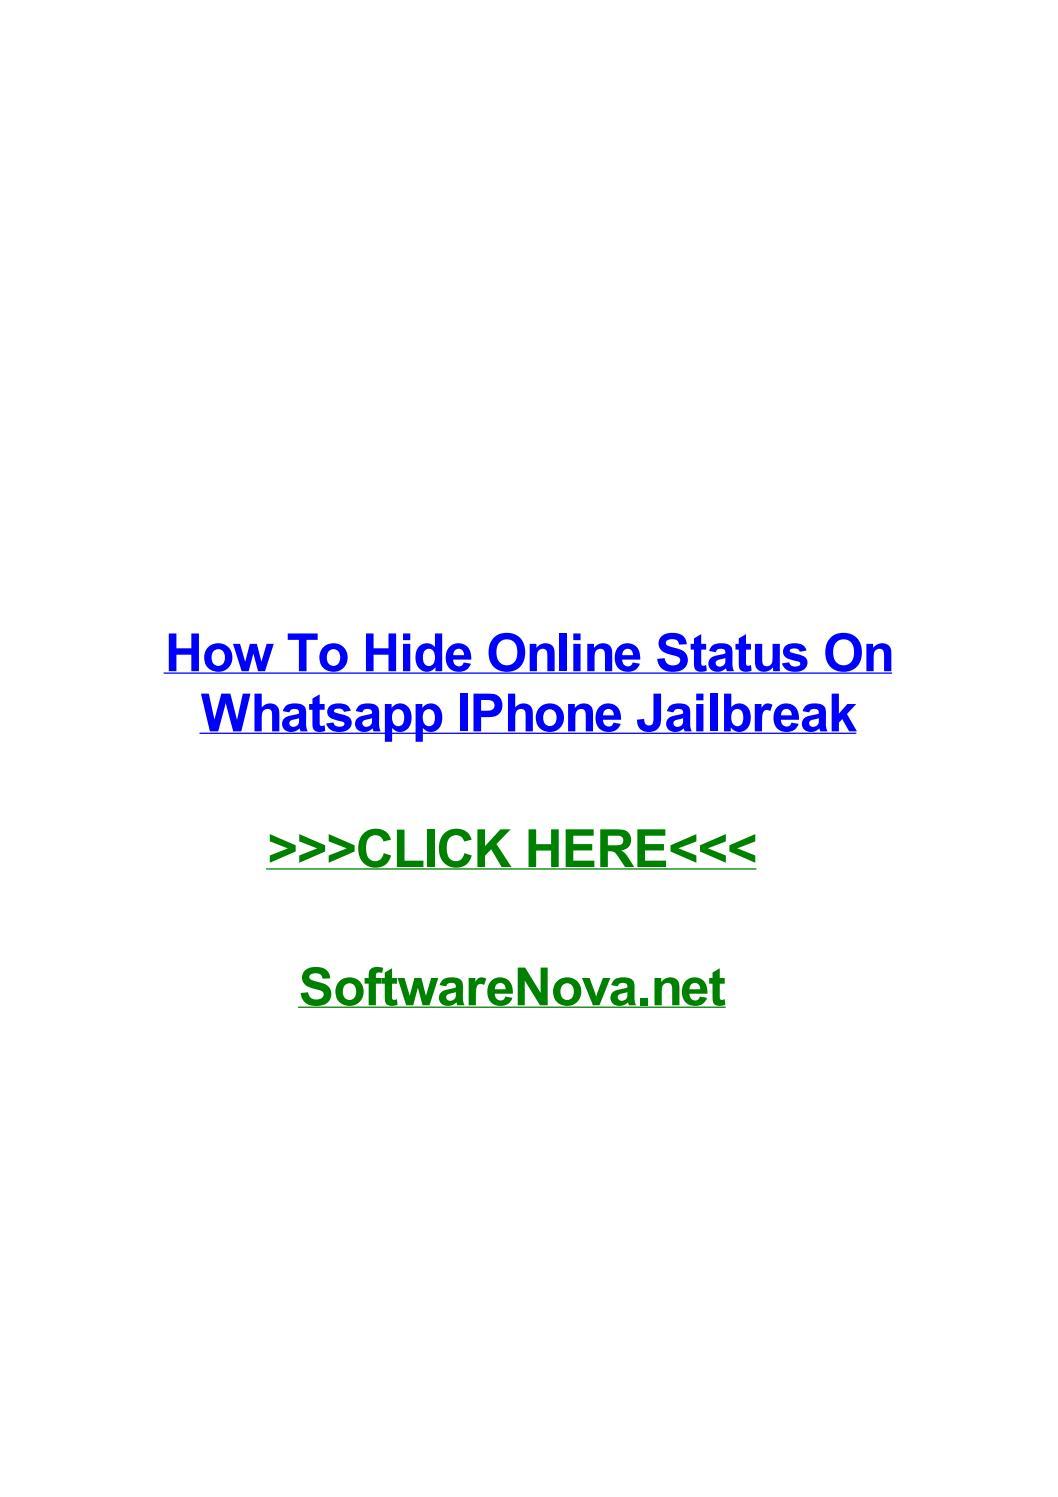 How to hide online status on whatsapp iphone jailbreak by